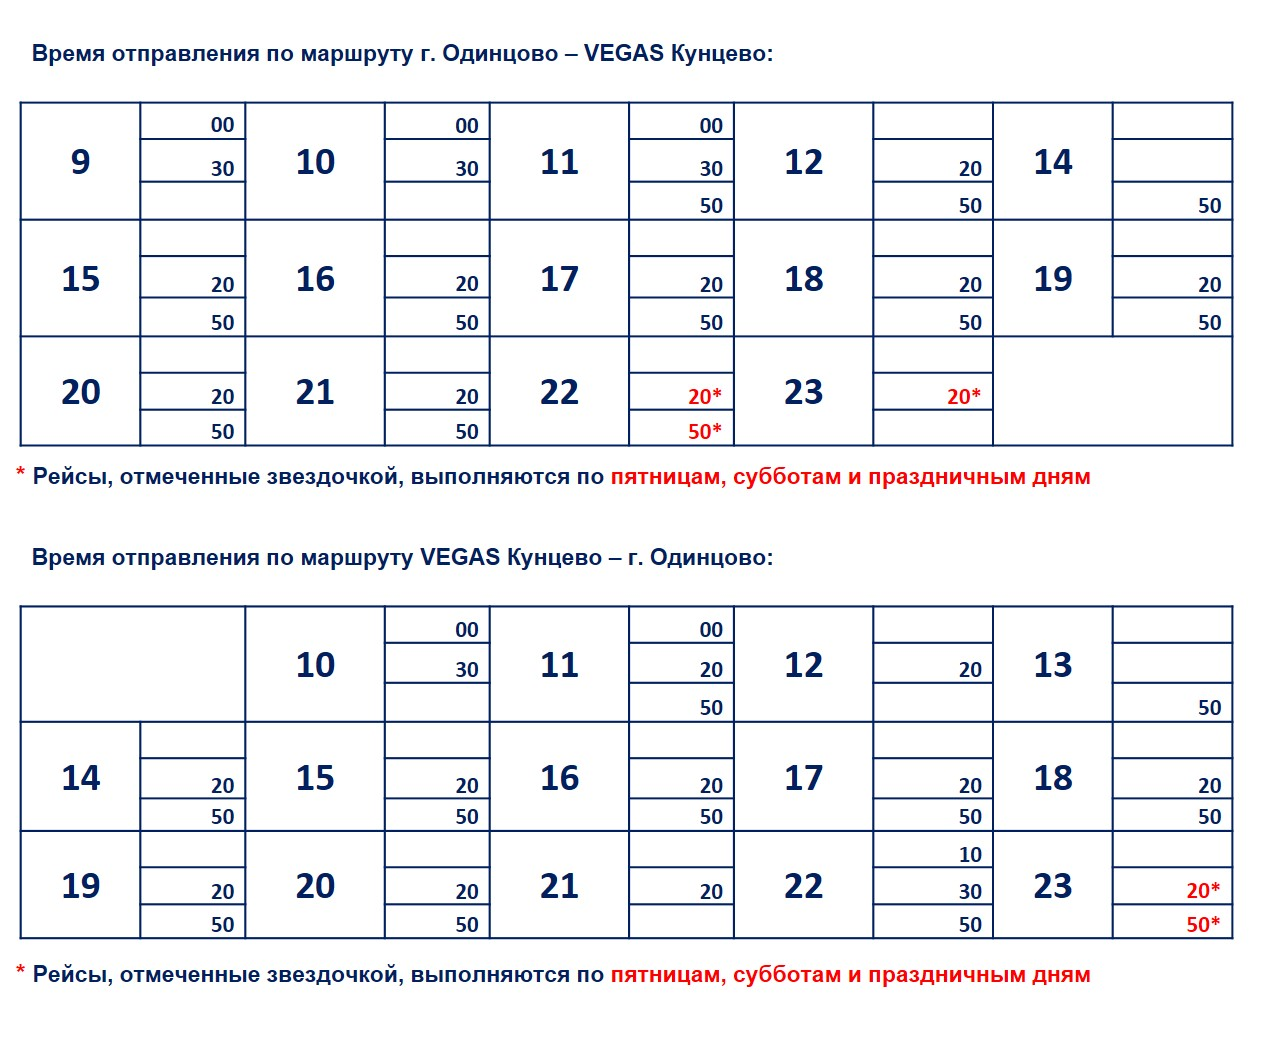 Расписание маршрутки Вегас Кунцево - Одинцово